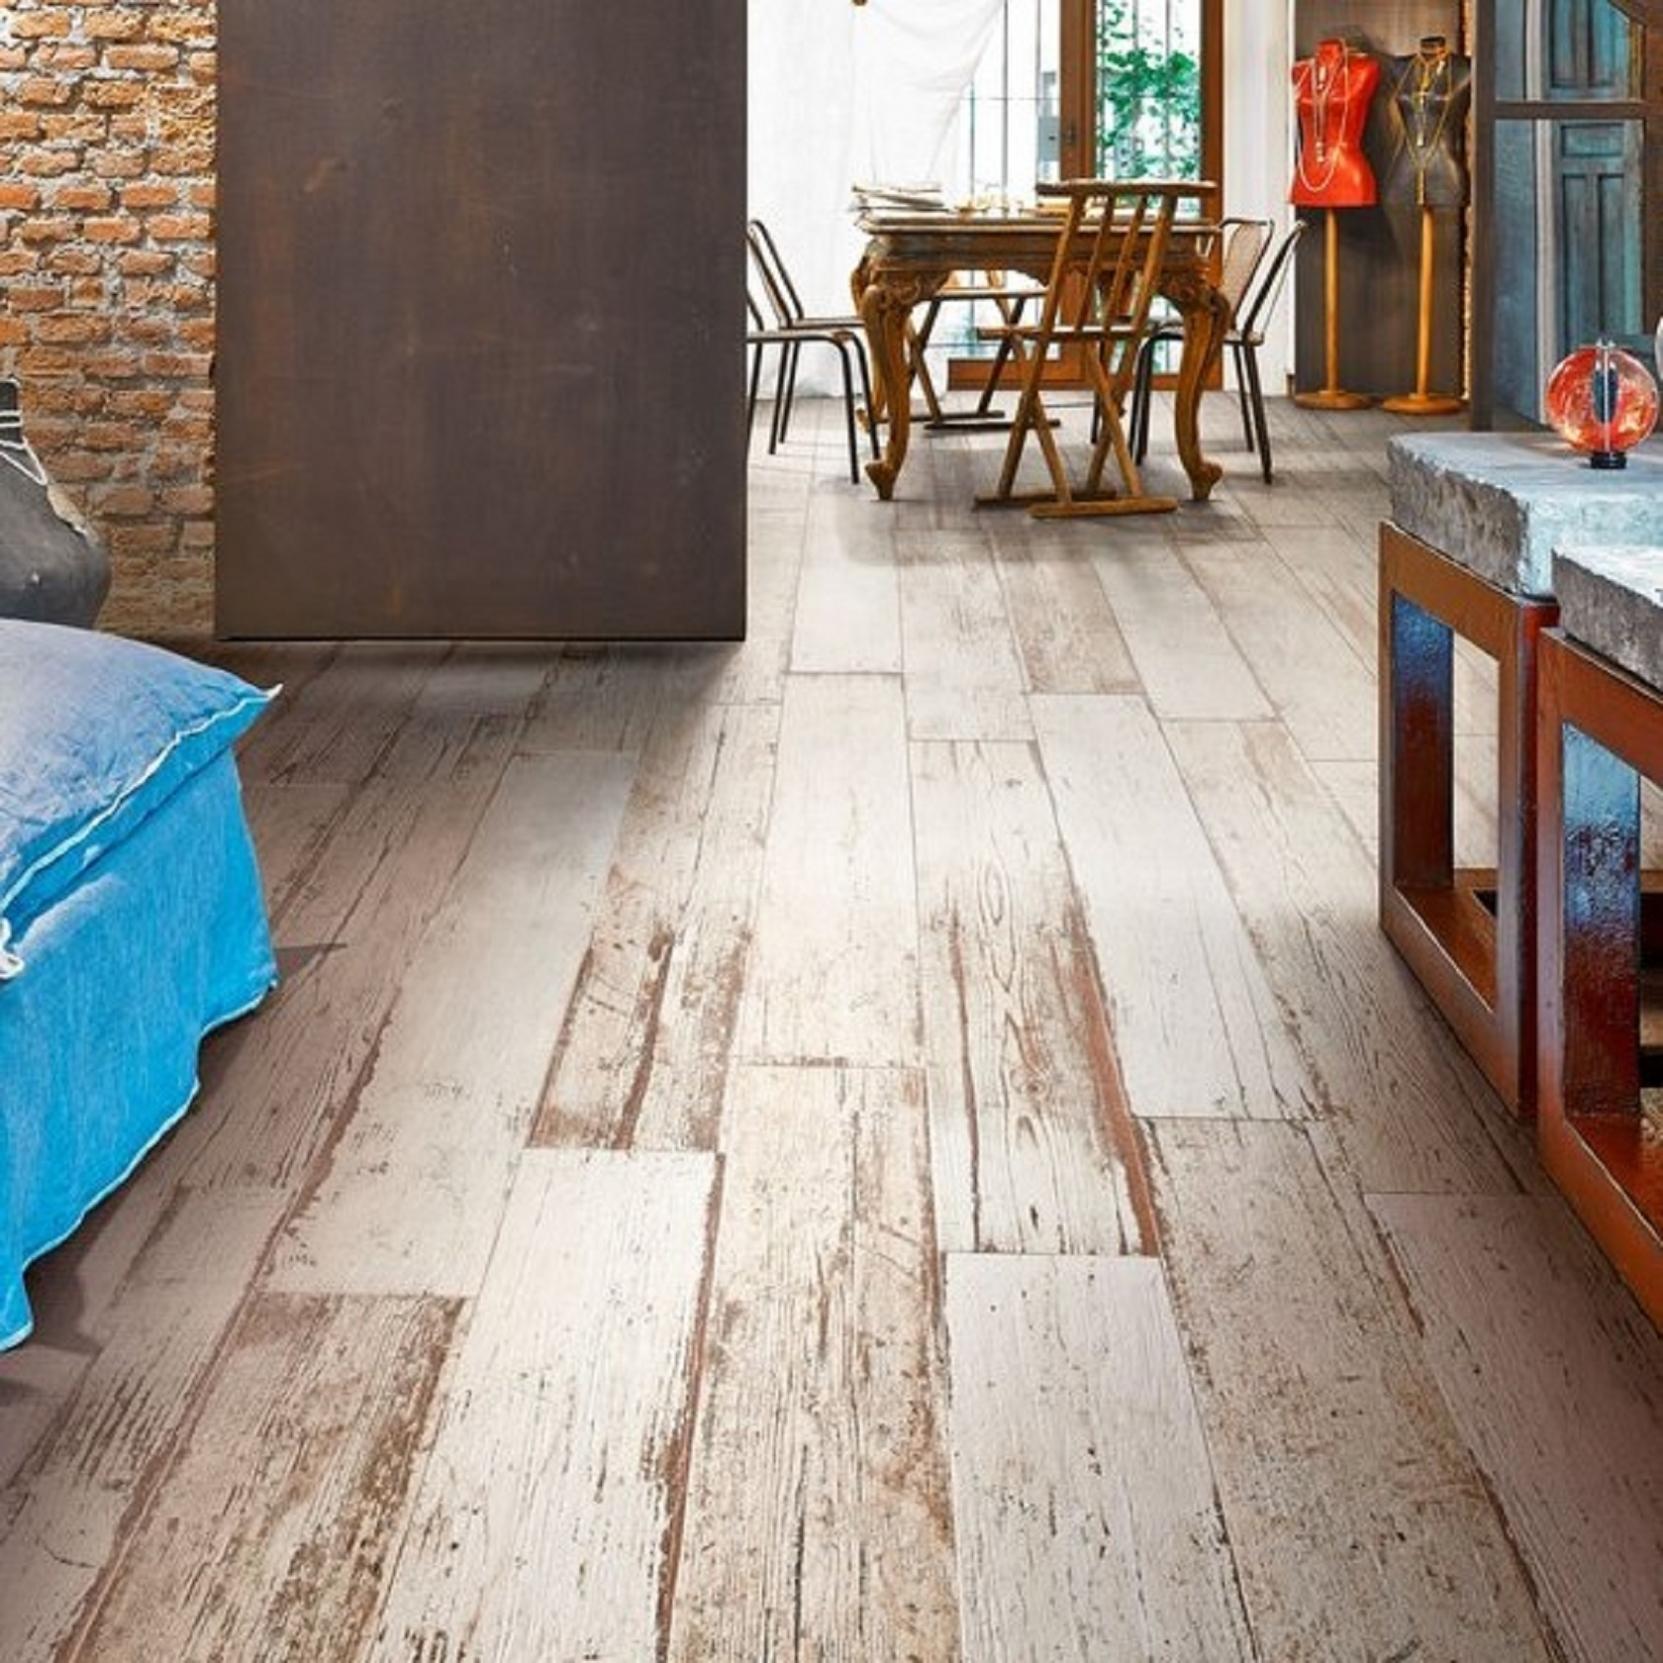 ceramica sant 39 agostino blendart natural tattahome. Black Bedroom Furniture Sets. Home Design Ideas